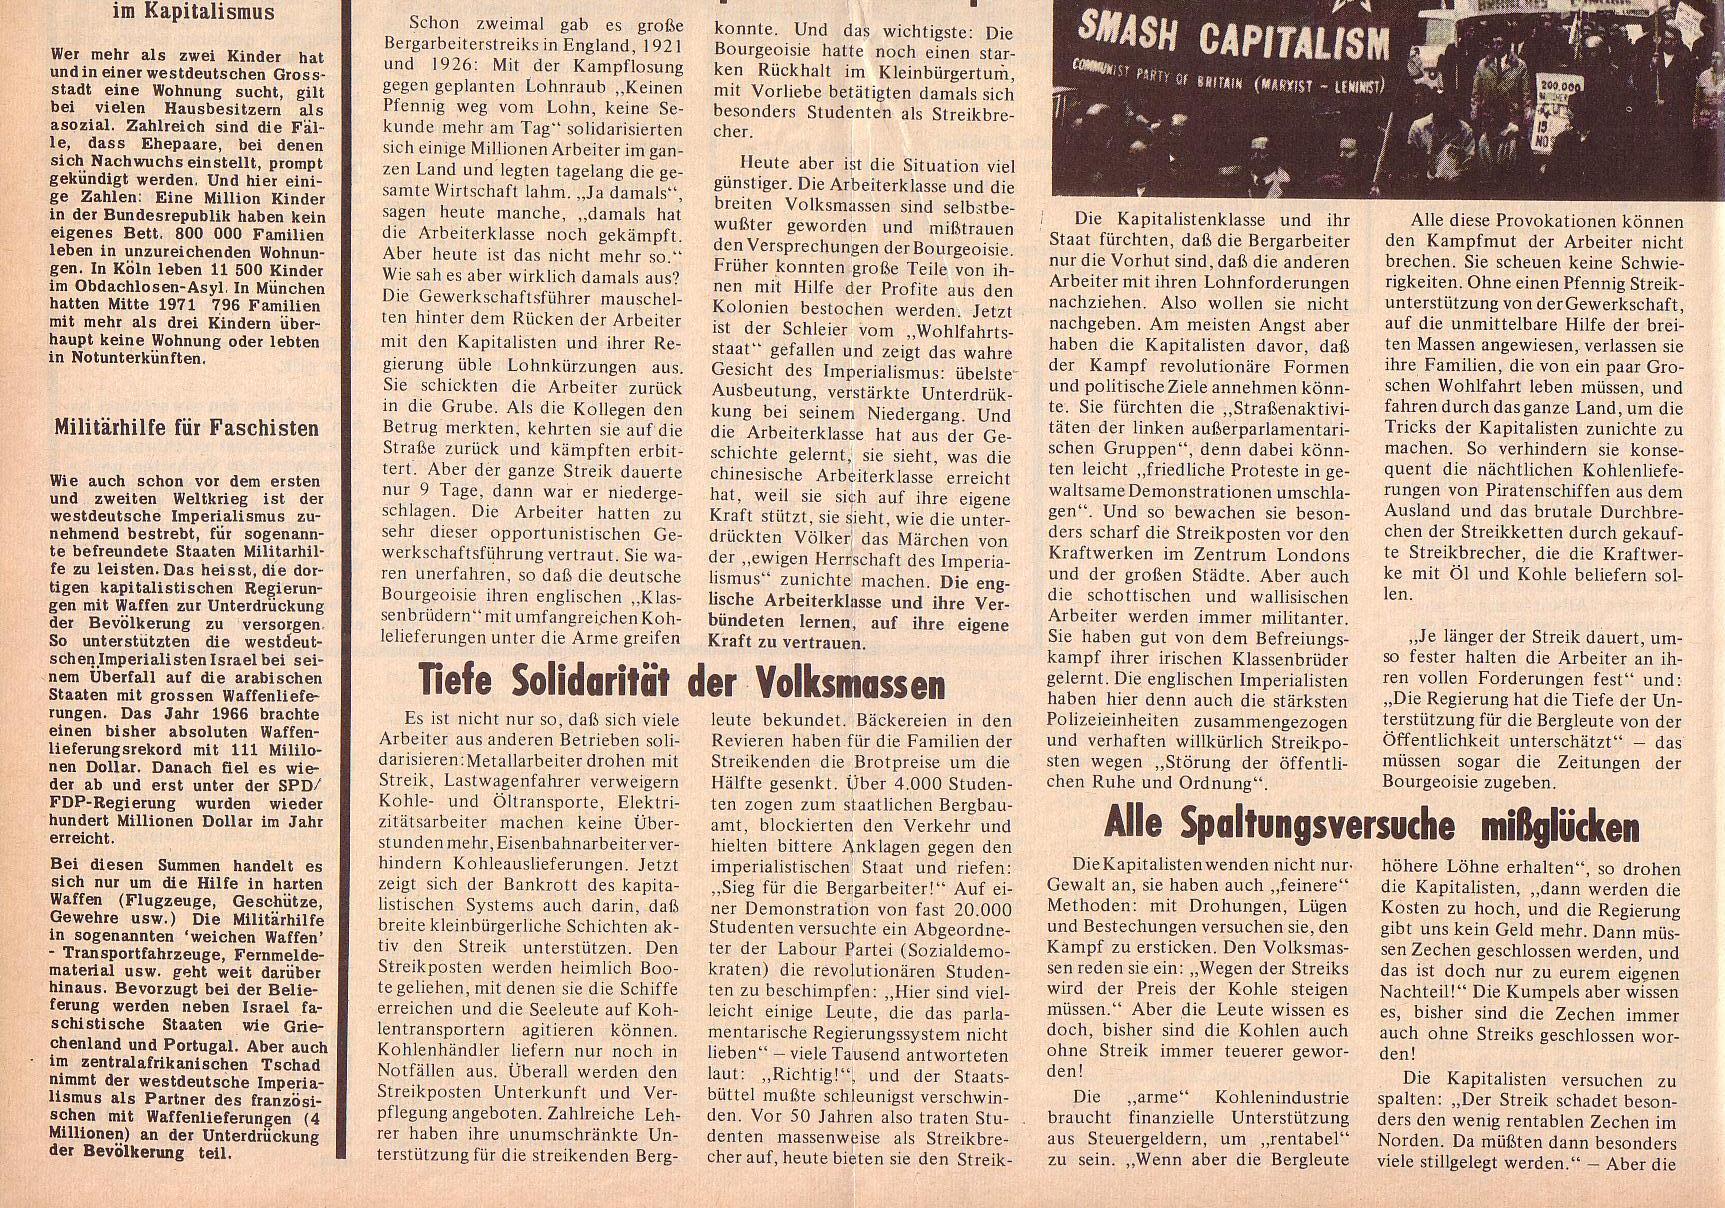 Roter Morgen, 6. Jg., 14. Februar 1972, Nr. 4, Seite 4b